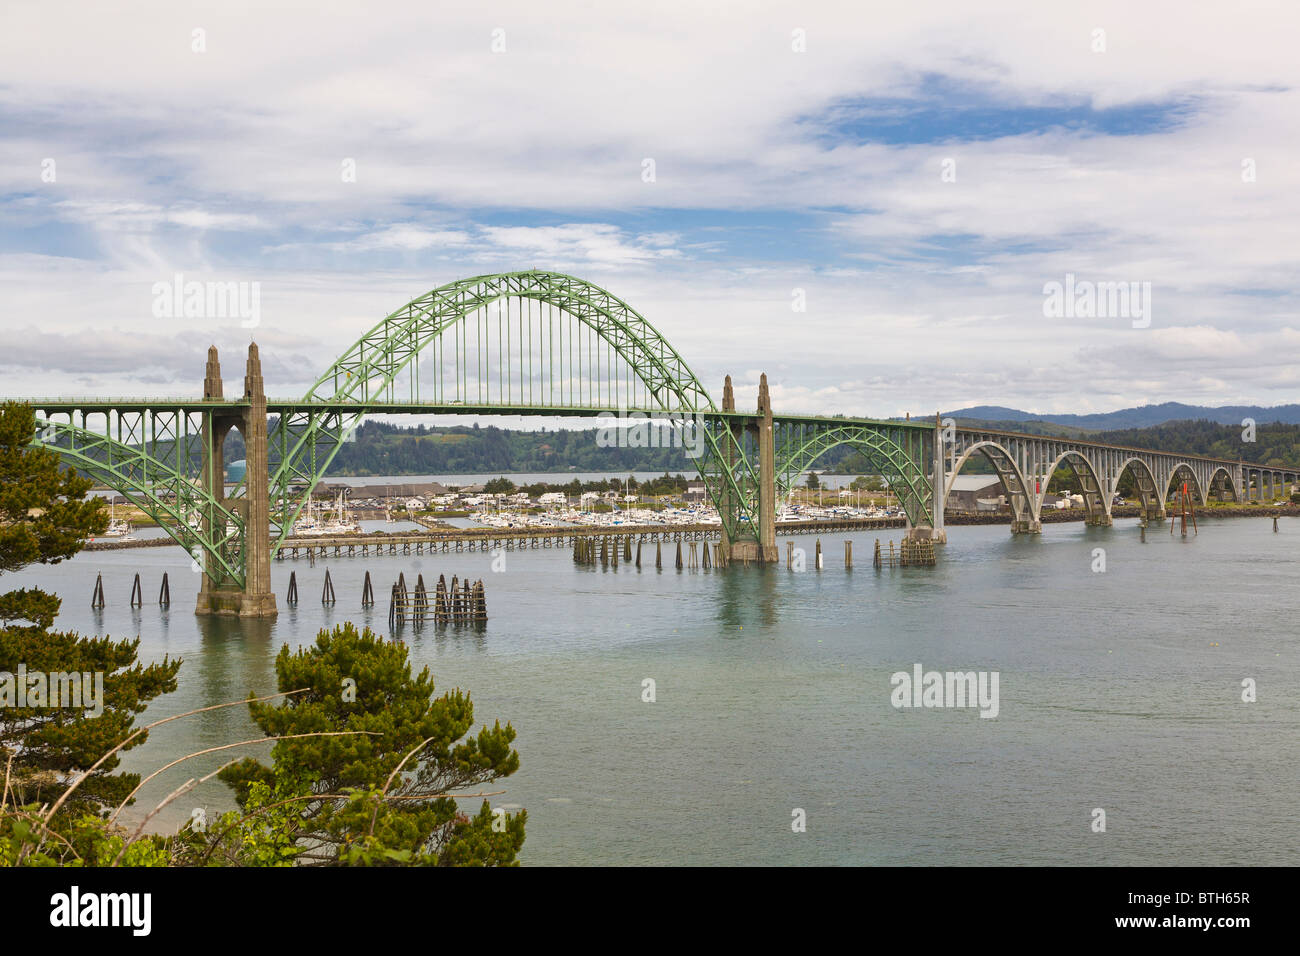 Siuslaw River Bridge entworfen von Conde B McCullough in Florenz Oregon Stockbild